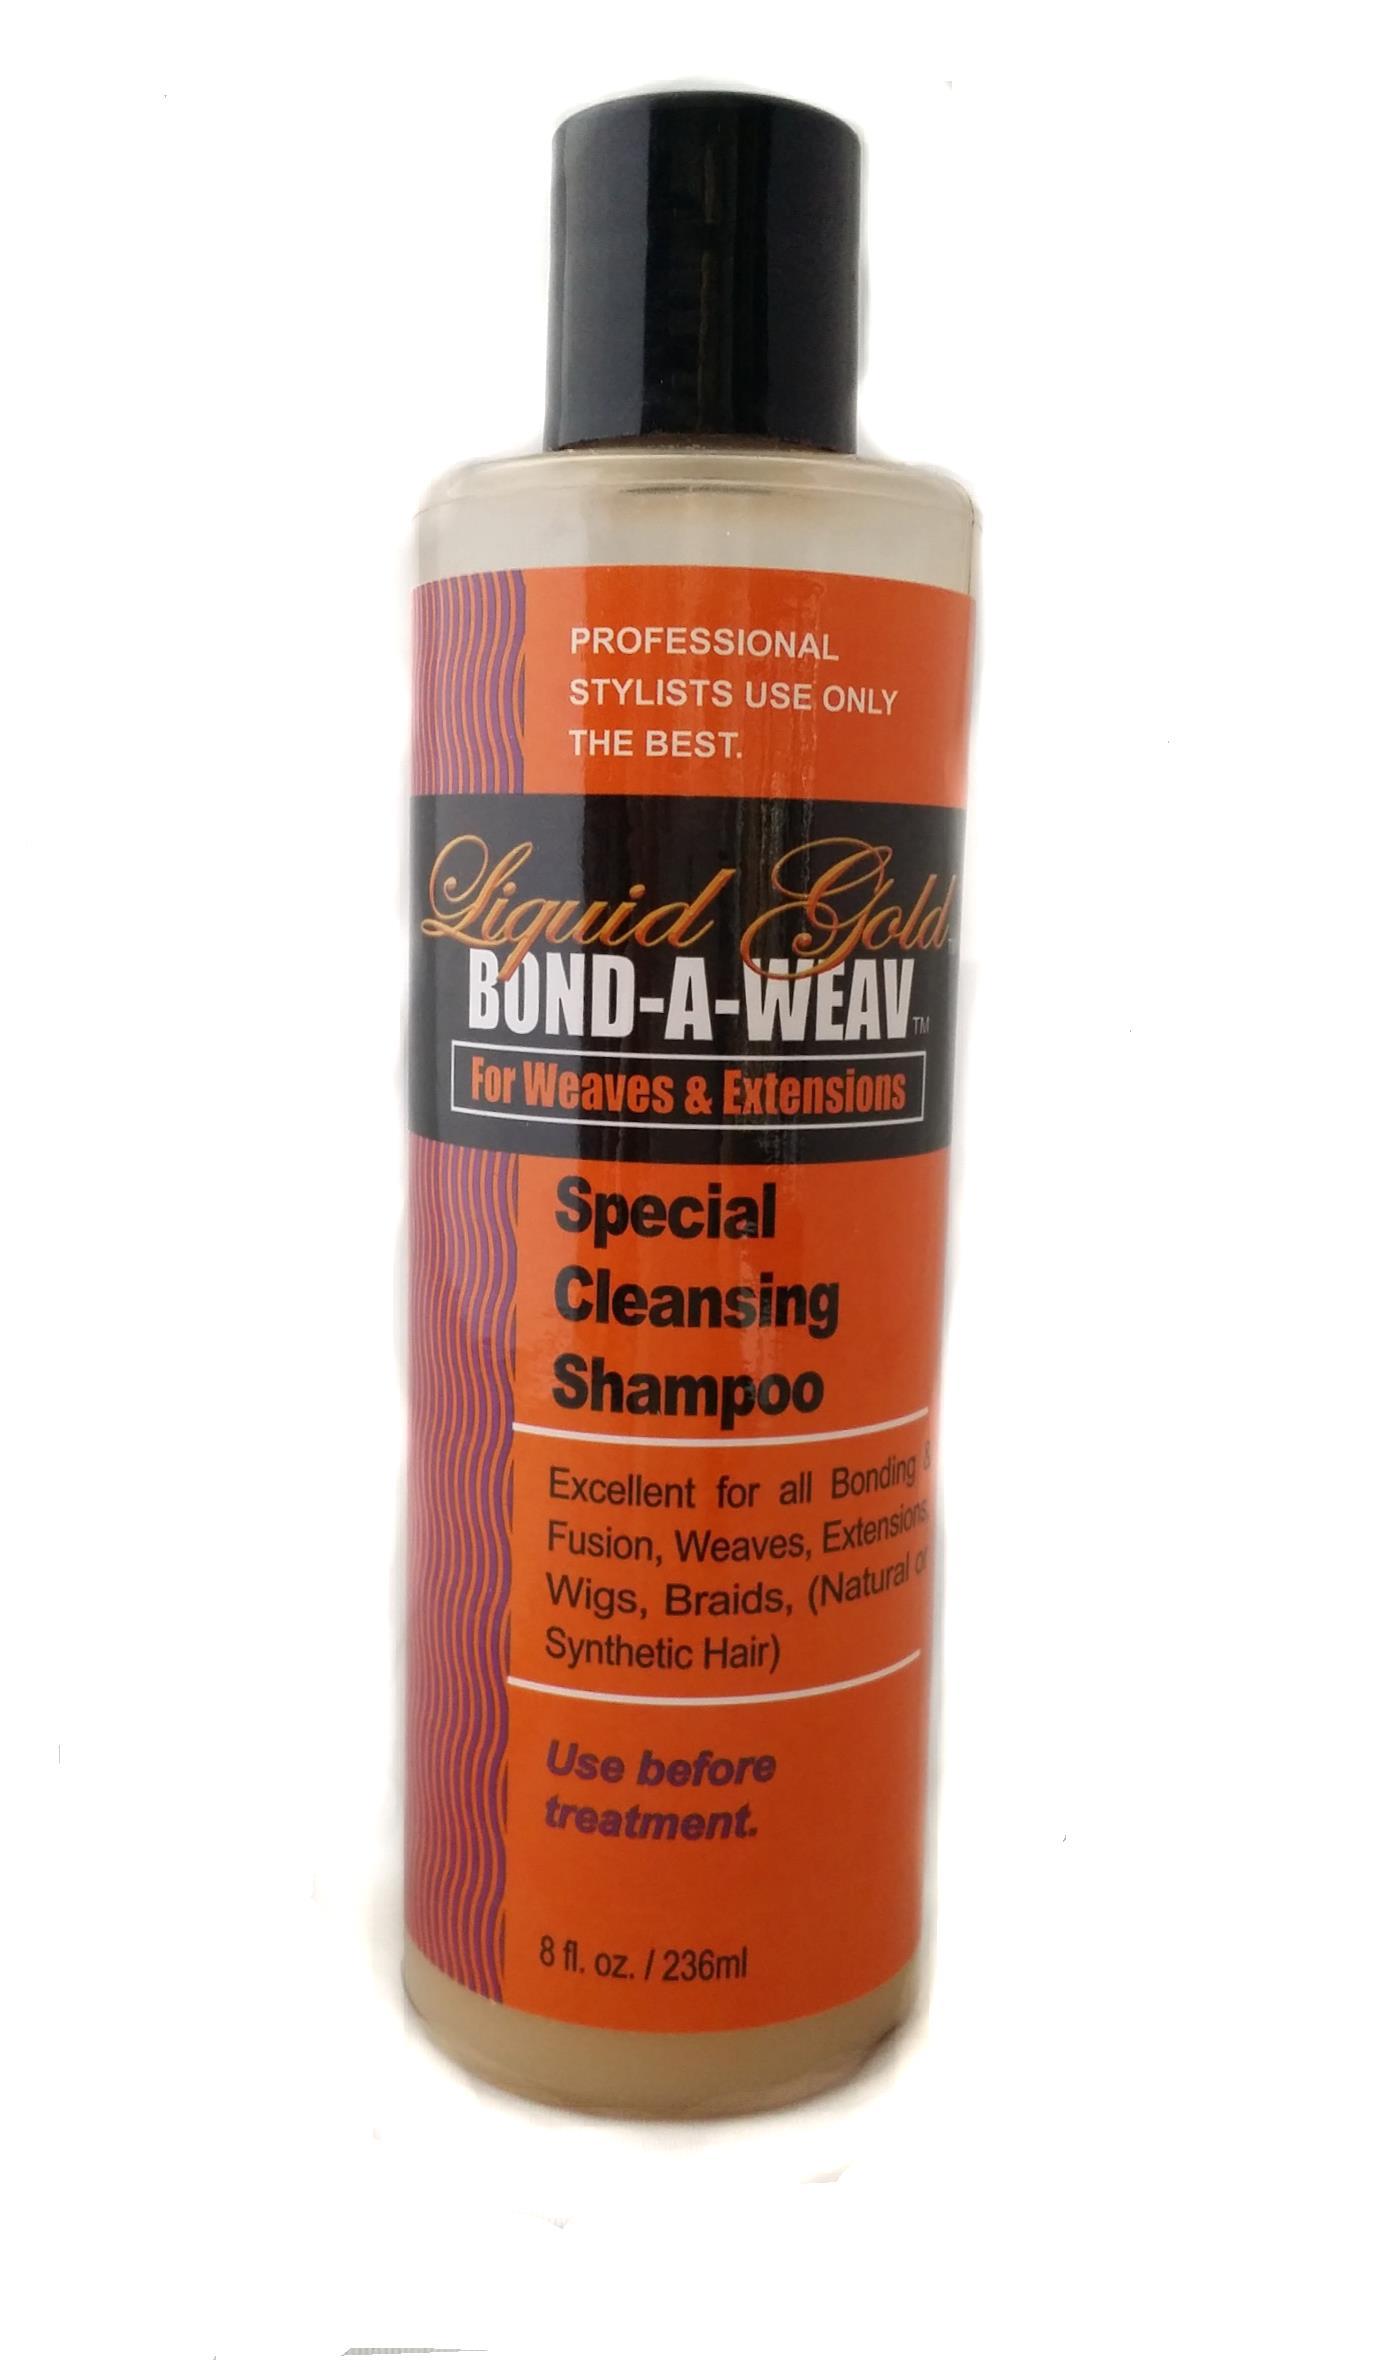 2x liquid gold bond a weav cleansing shampoo f r. Black Bedroom Furniture Sets. Home Design Ideas